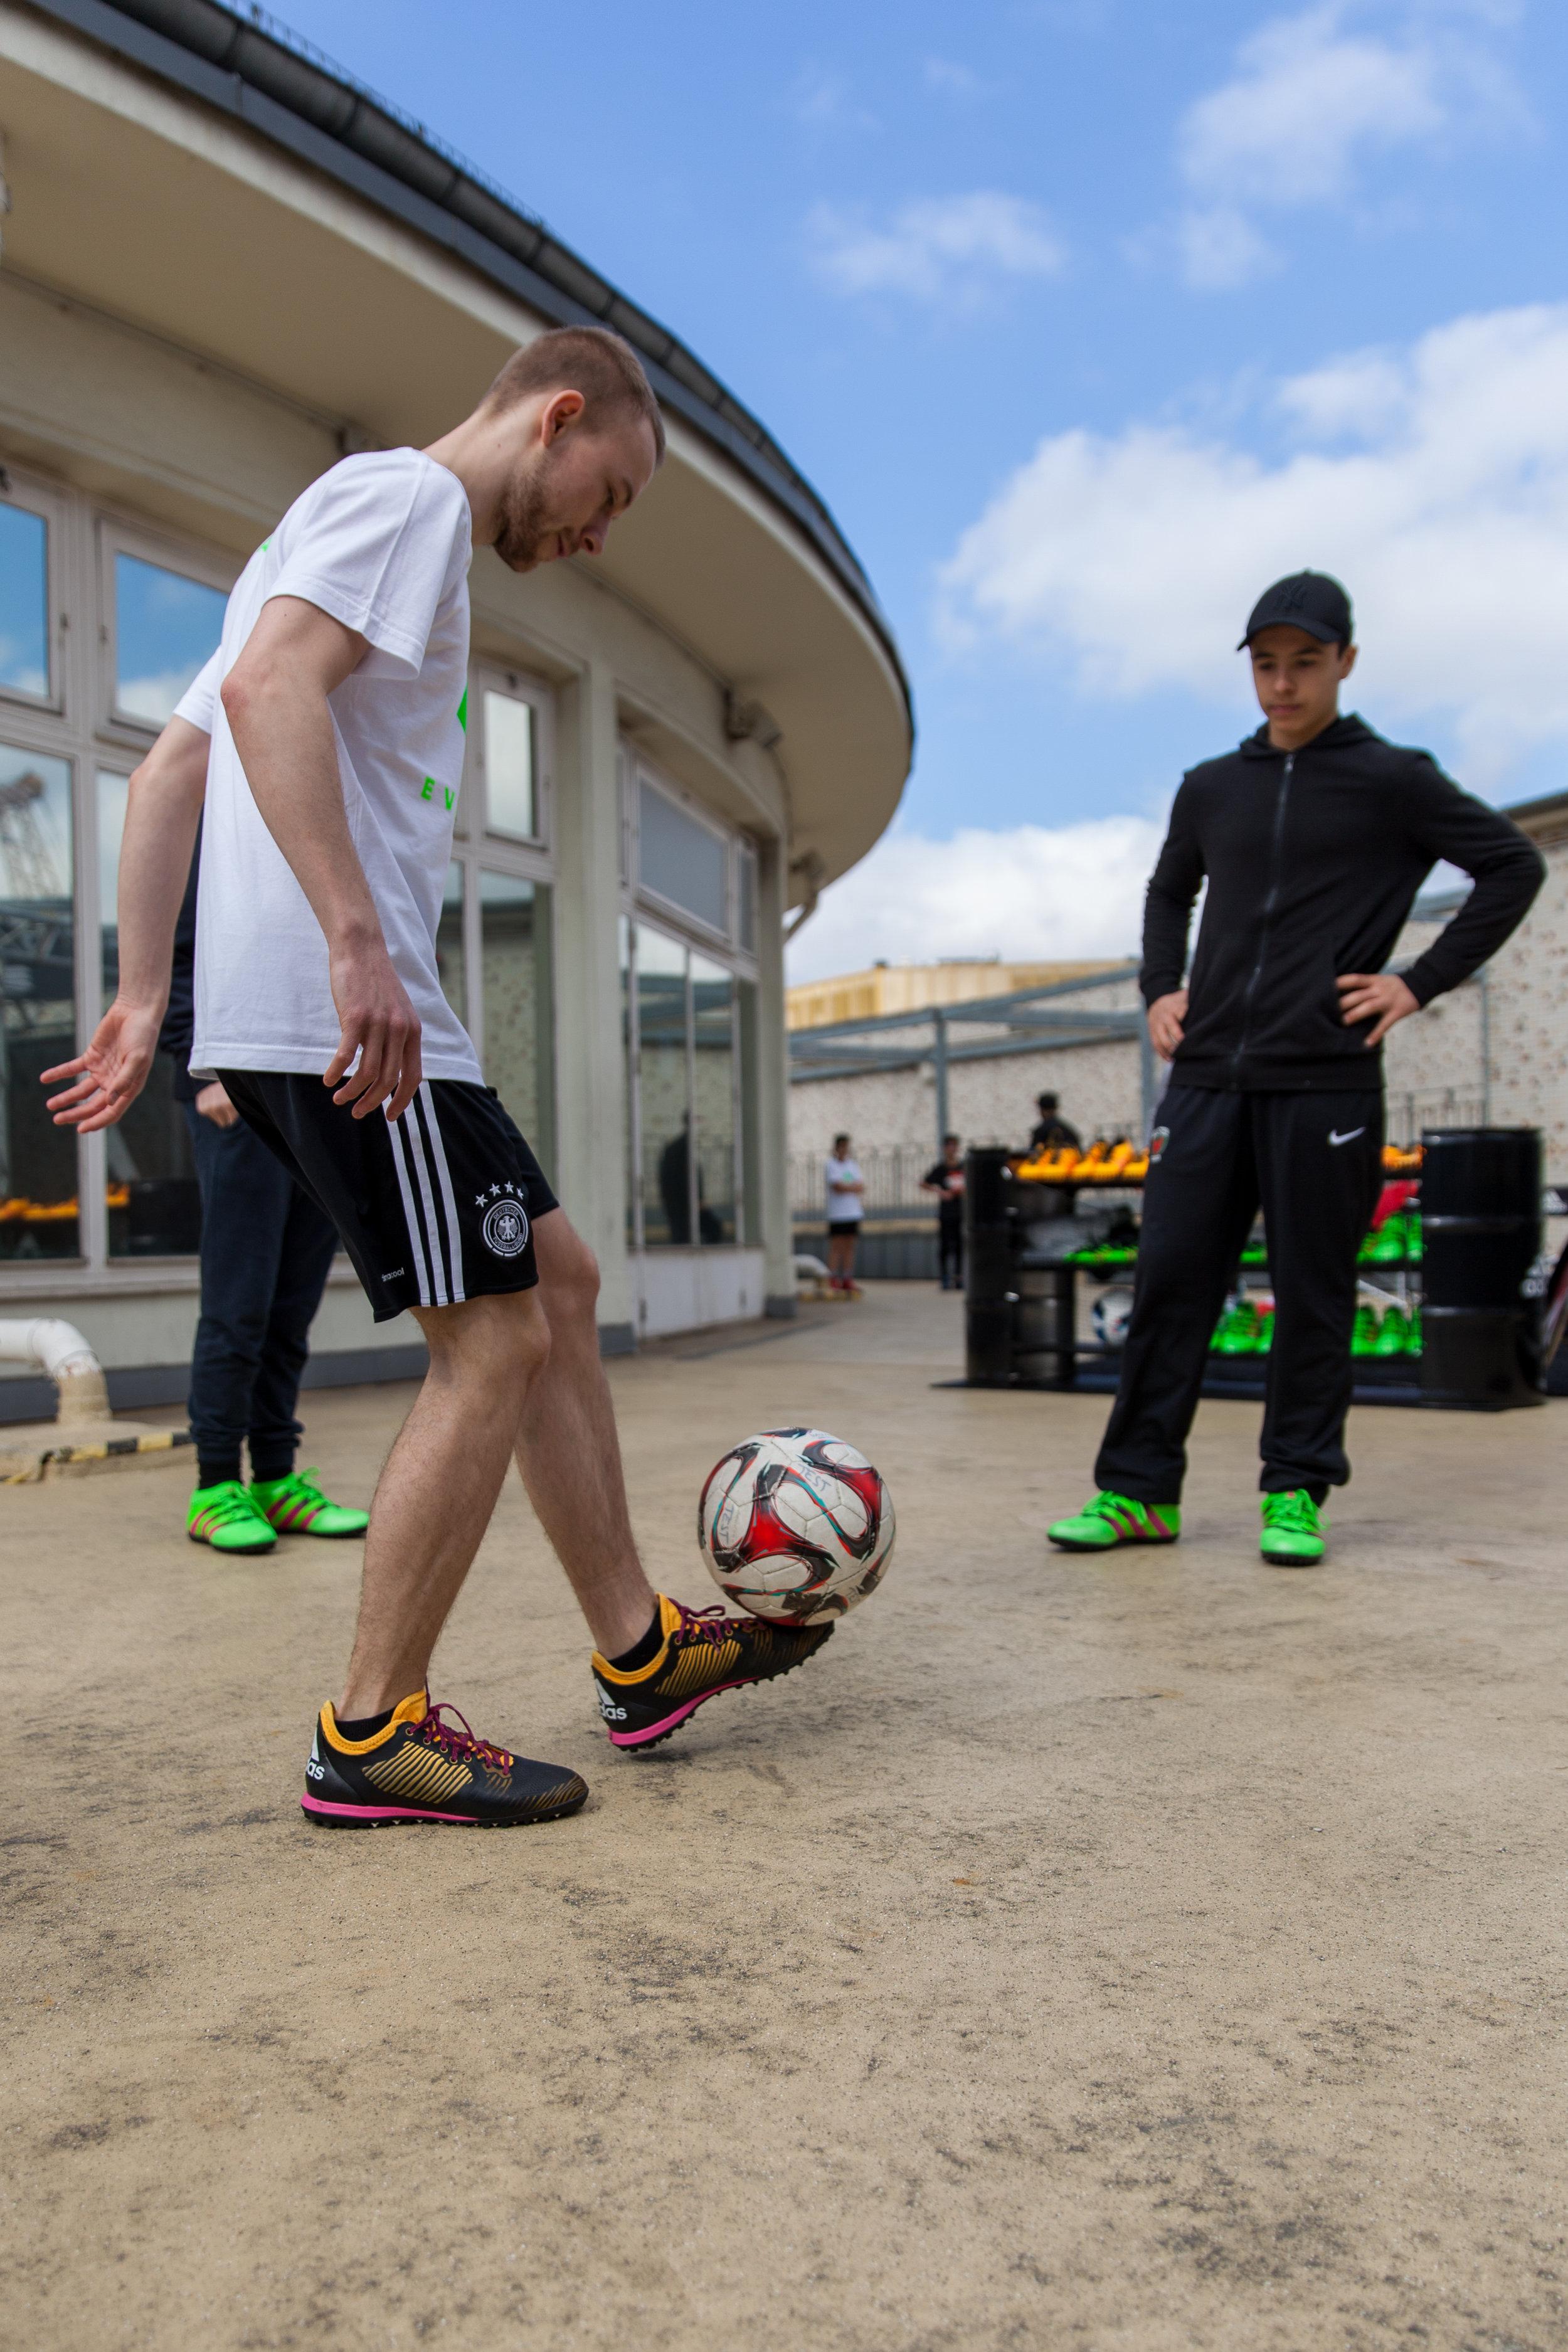 Karstadt Sports - Adidas - Inspiring